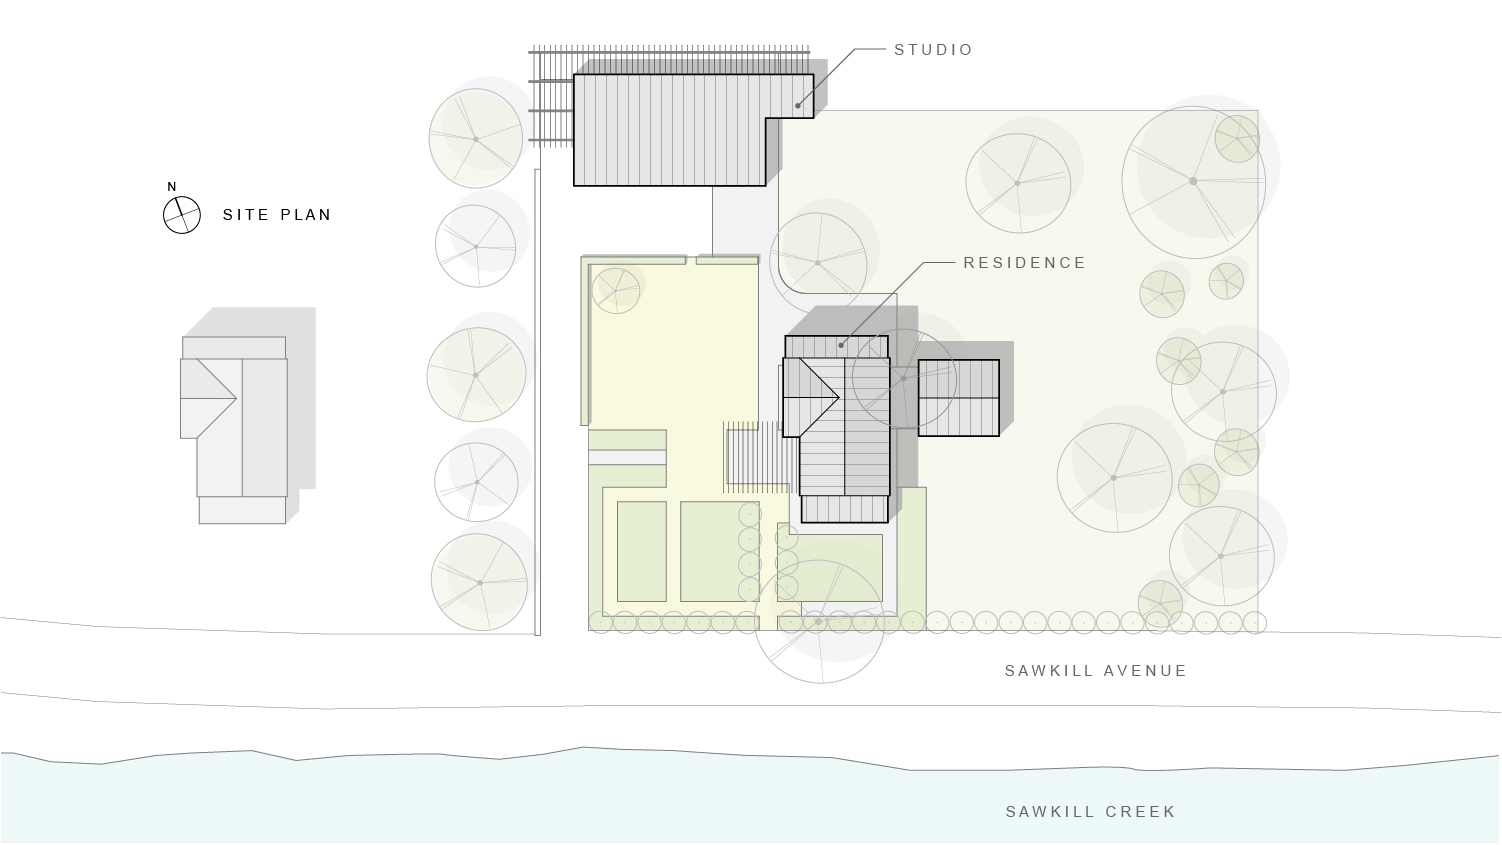 rpa-studio-site-plan